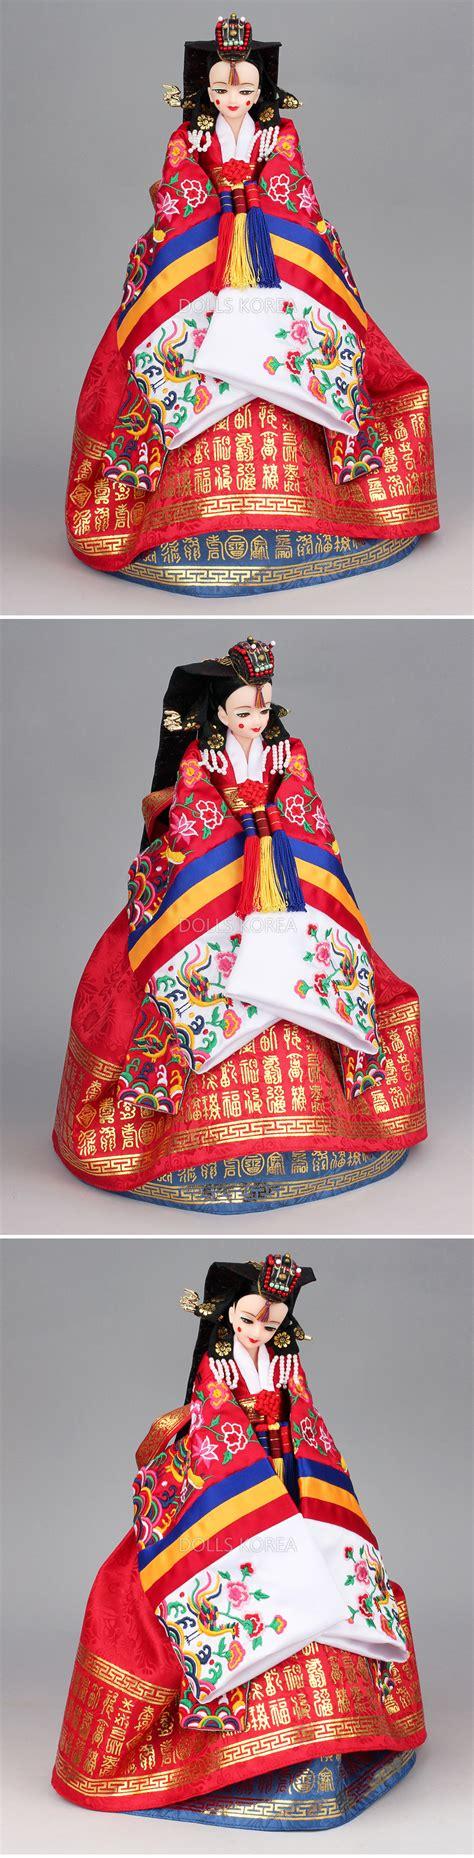 Index of /eBay_img/barbie doll/Hwarot